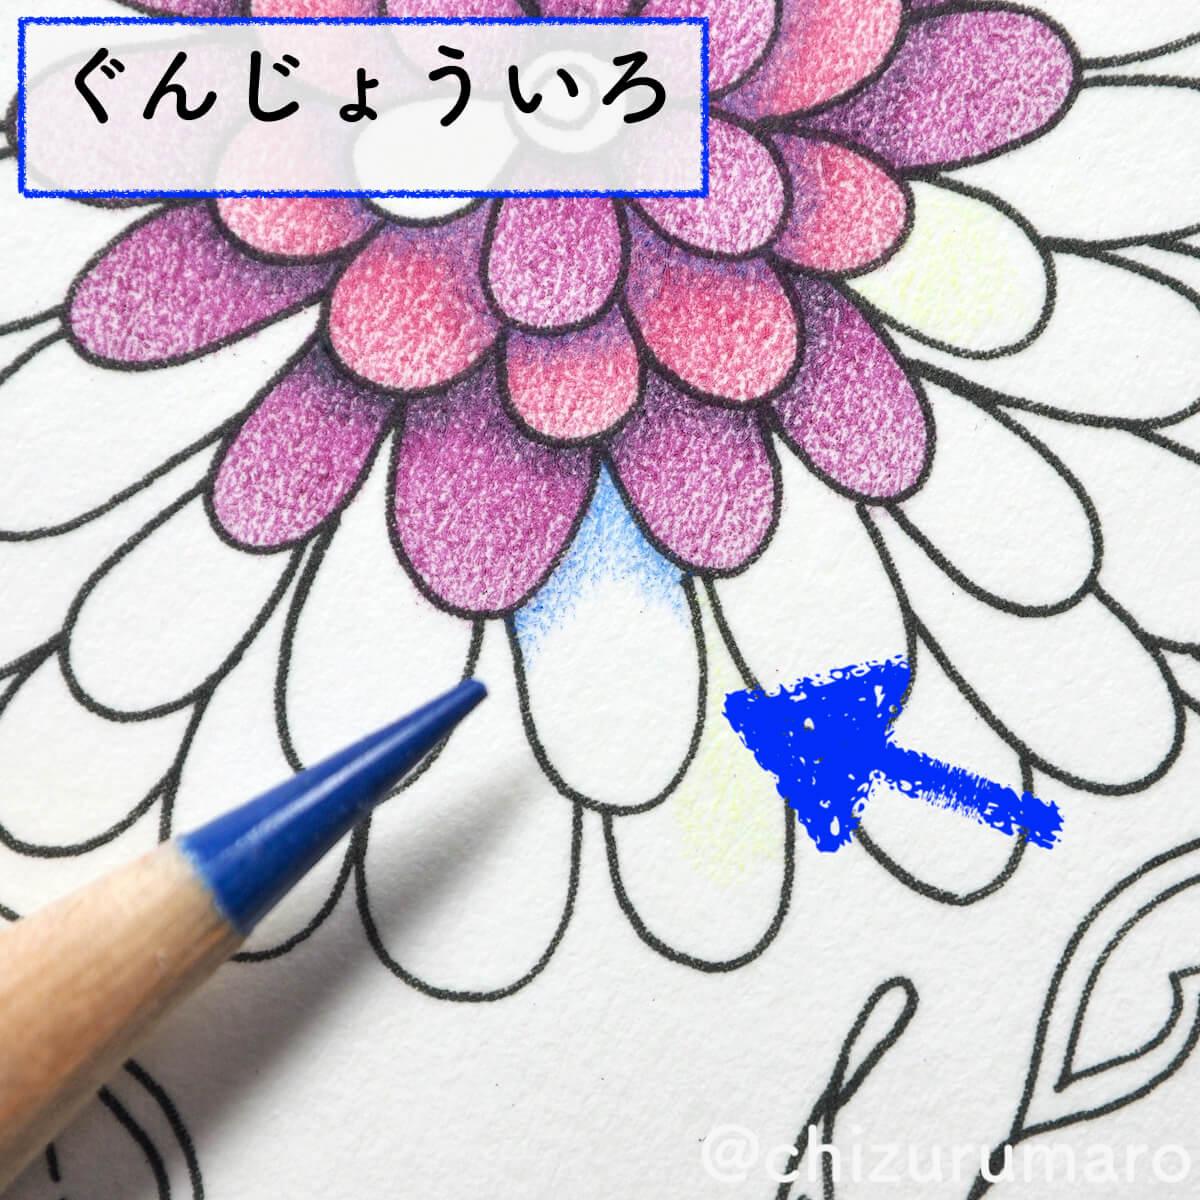 f:id:chizurumaro:20200415163833j:plain